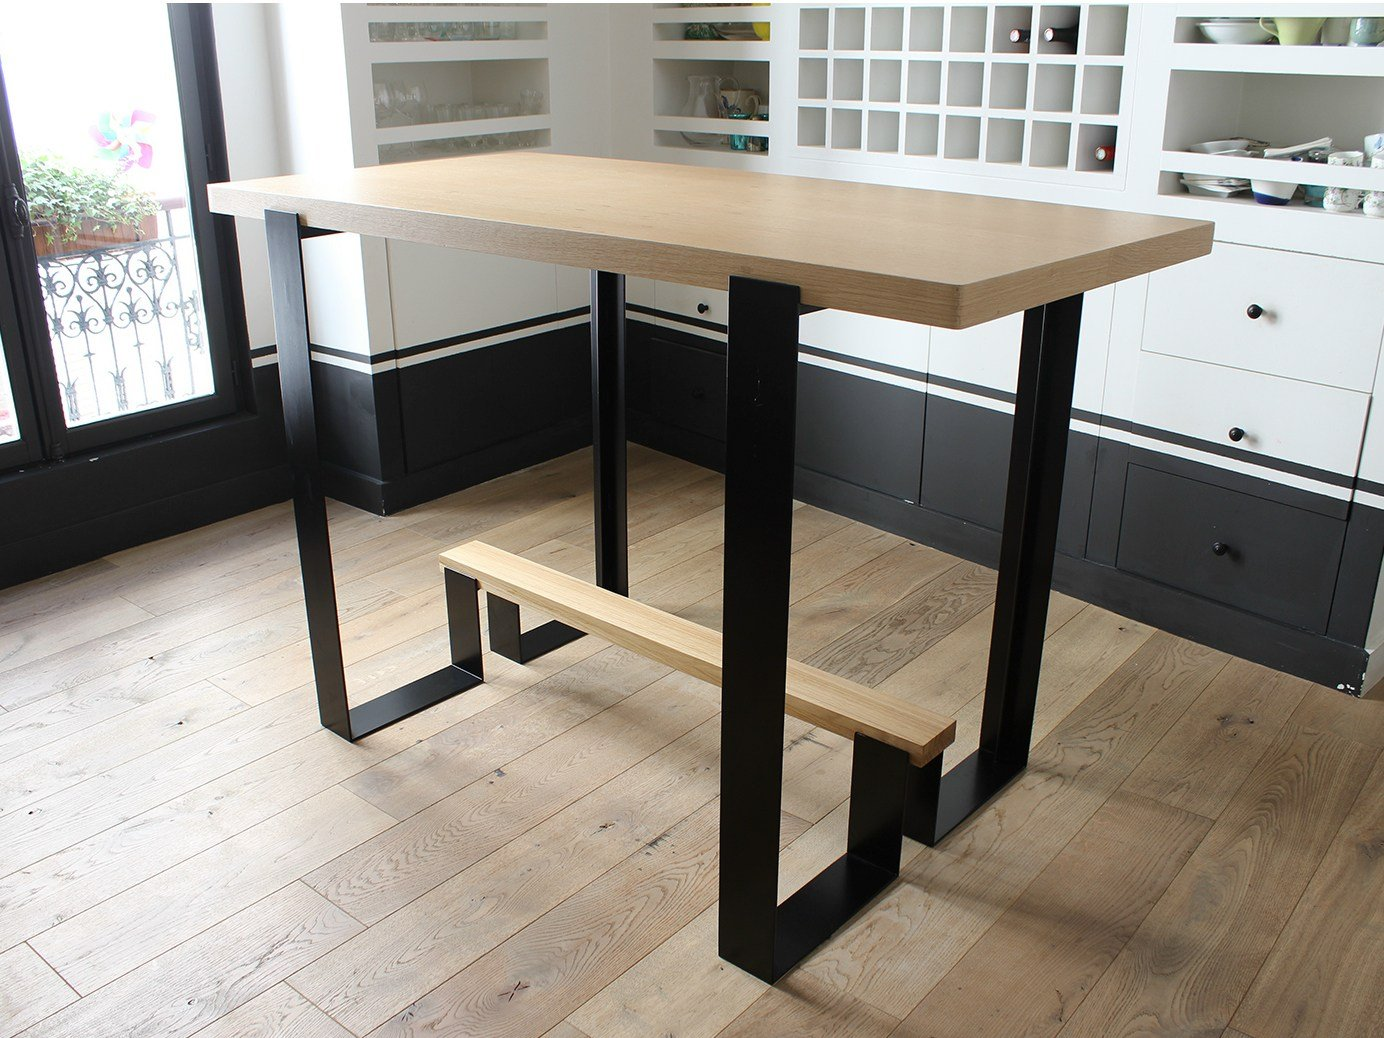 Mesas De Cocina Altas. Mesa De Cocina Extensible Cocina Y Office ...